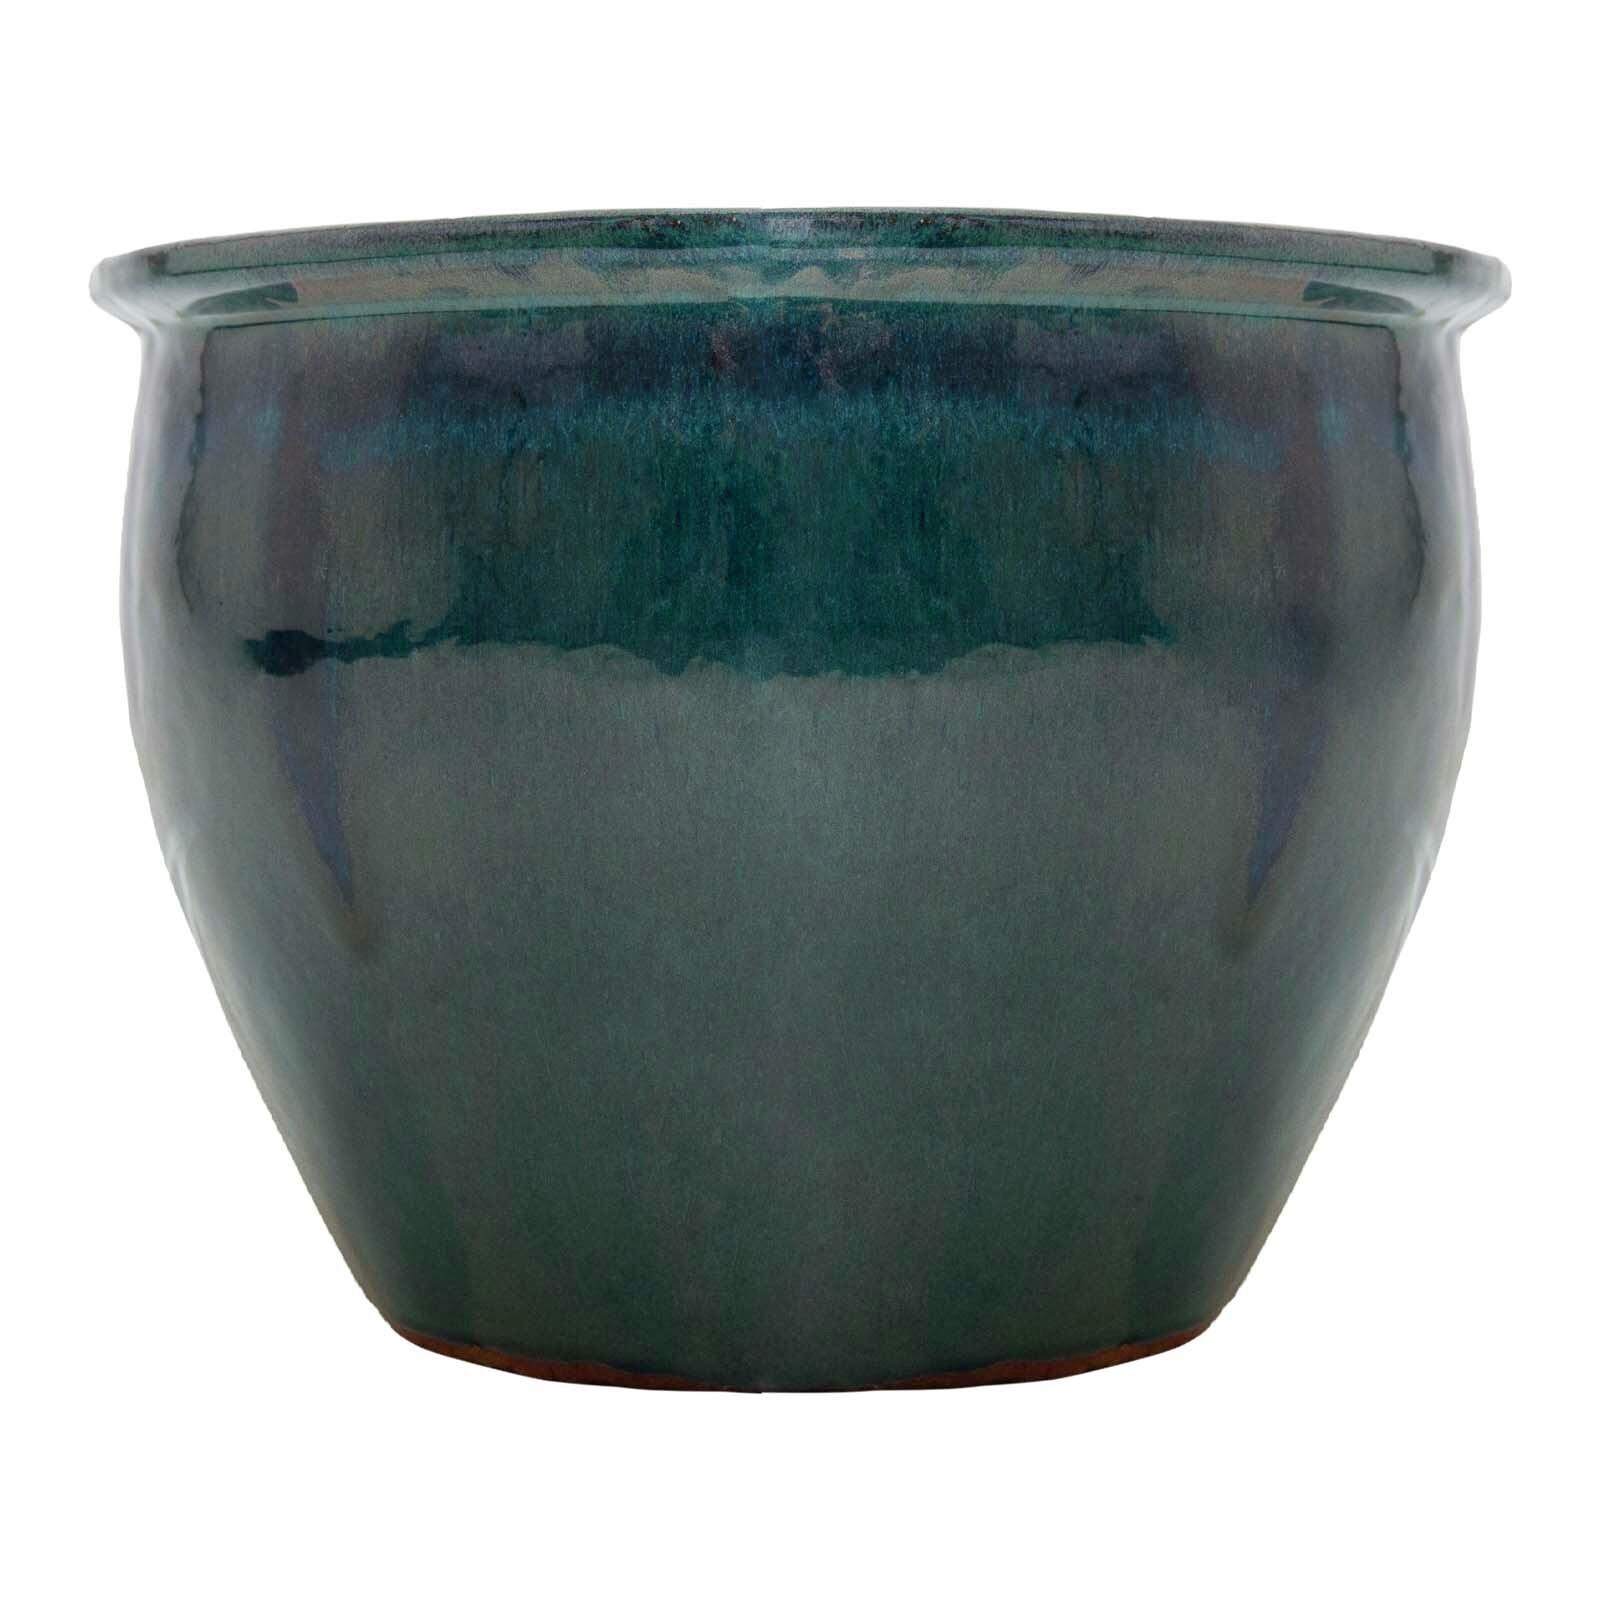 Northcote Pottery 46 x 36cm Forest Green Primo Jardin Egg Planter